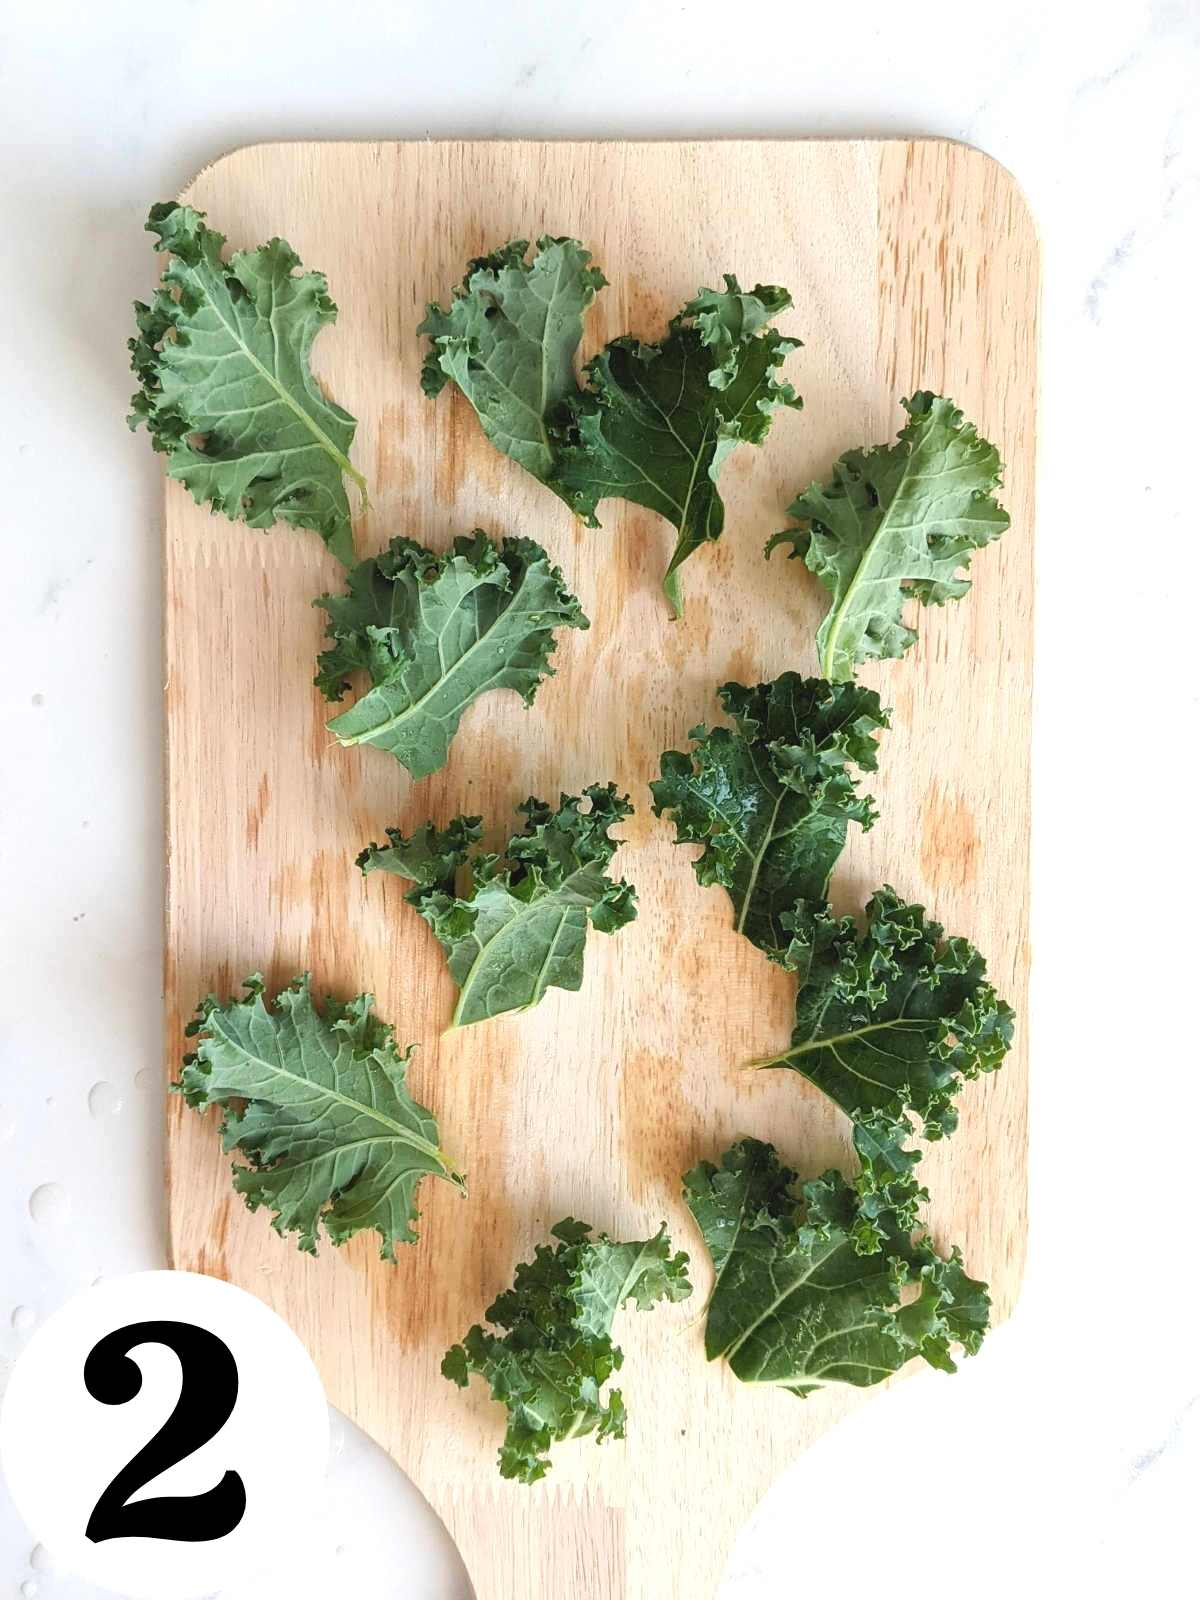 Chopped kale leaves on a cutting board.